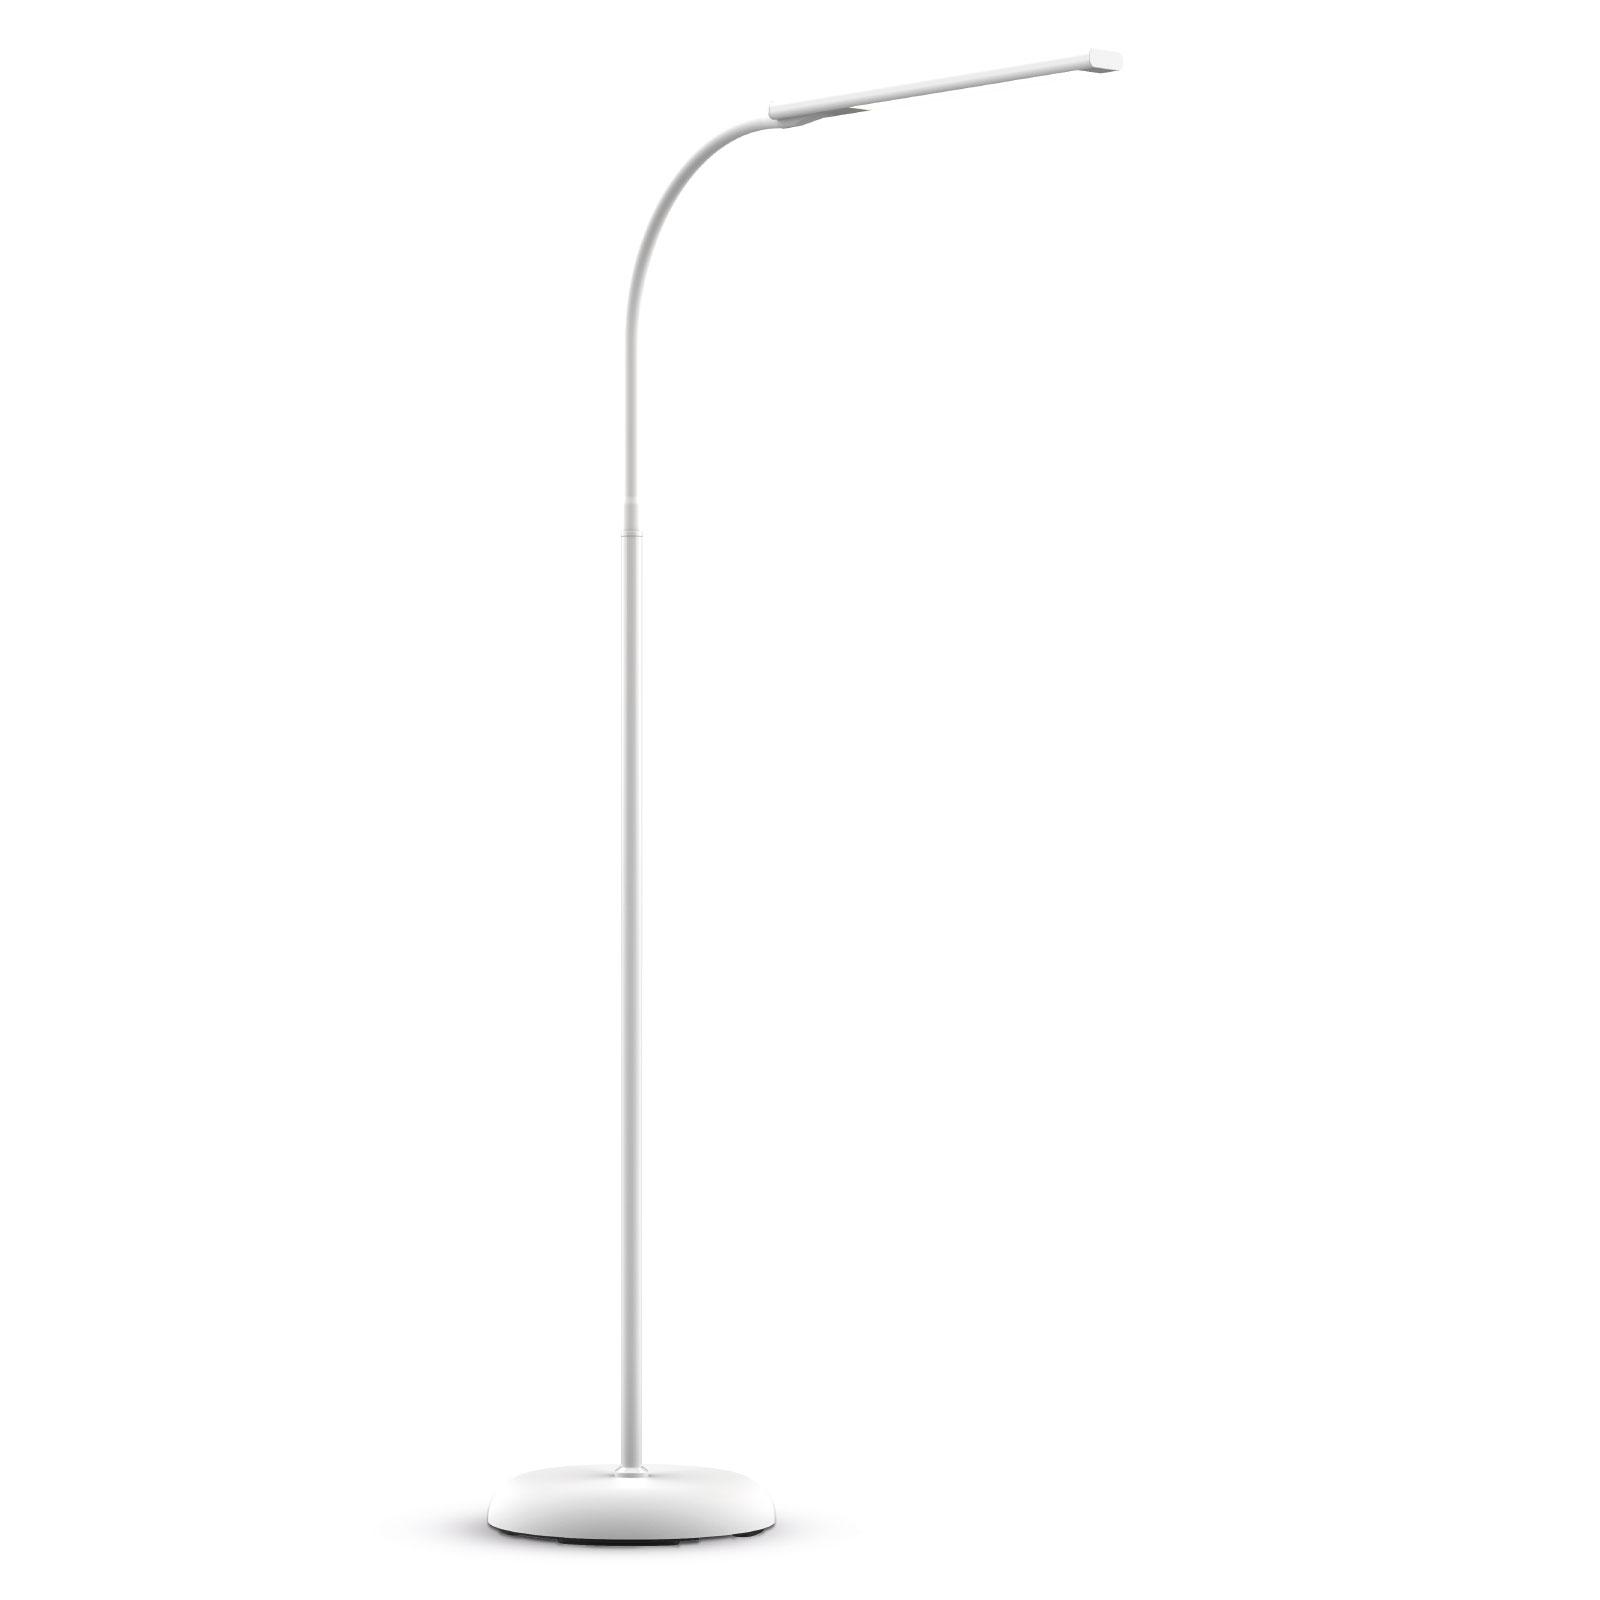 LED-golvlampa MAULpirro dimbar, vit